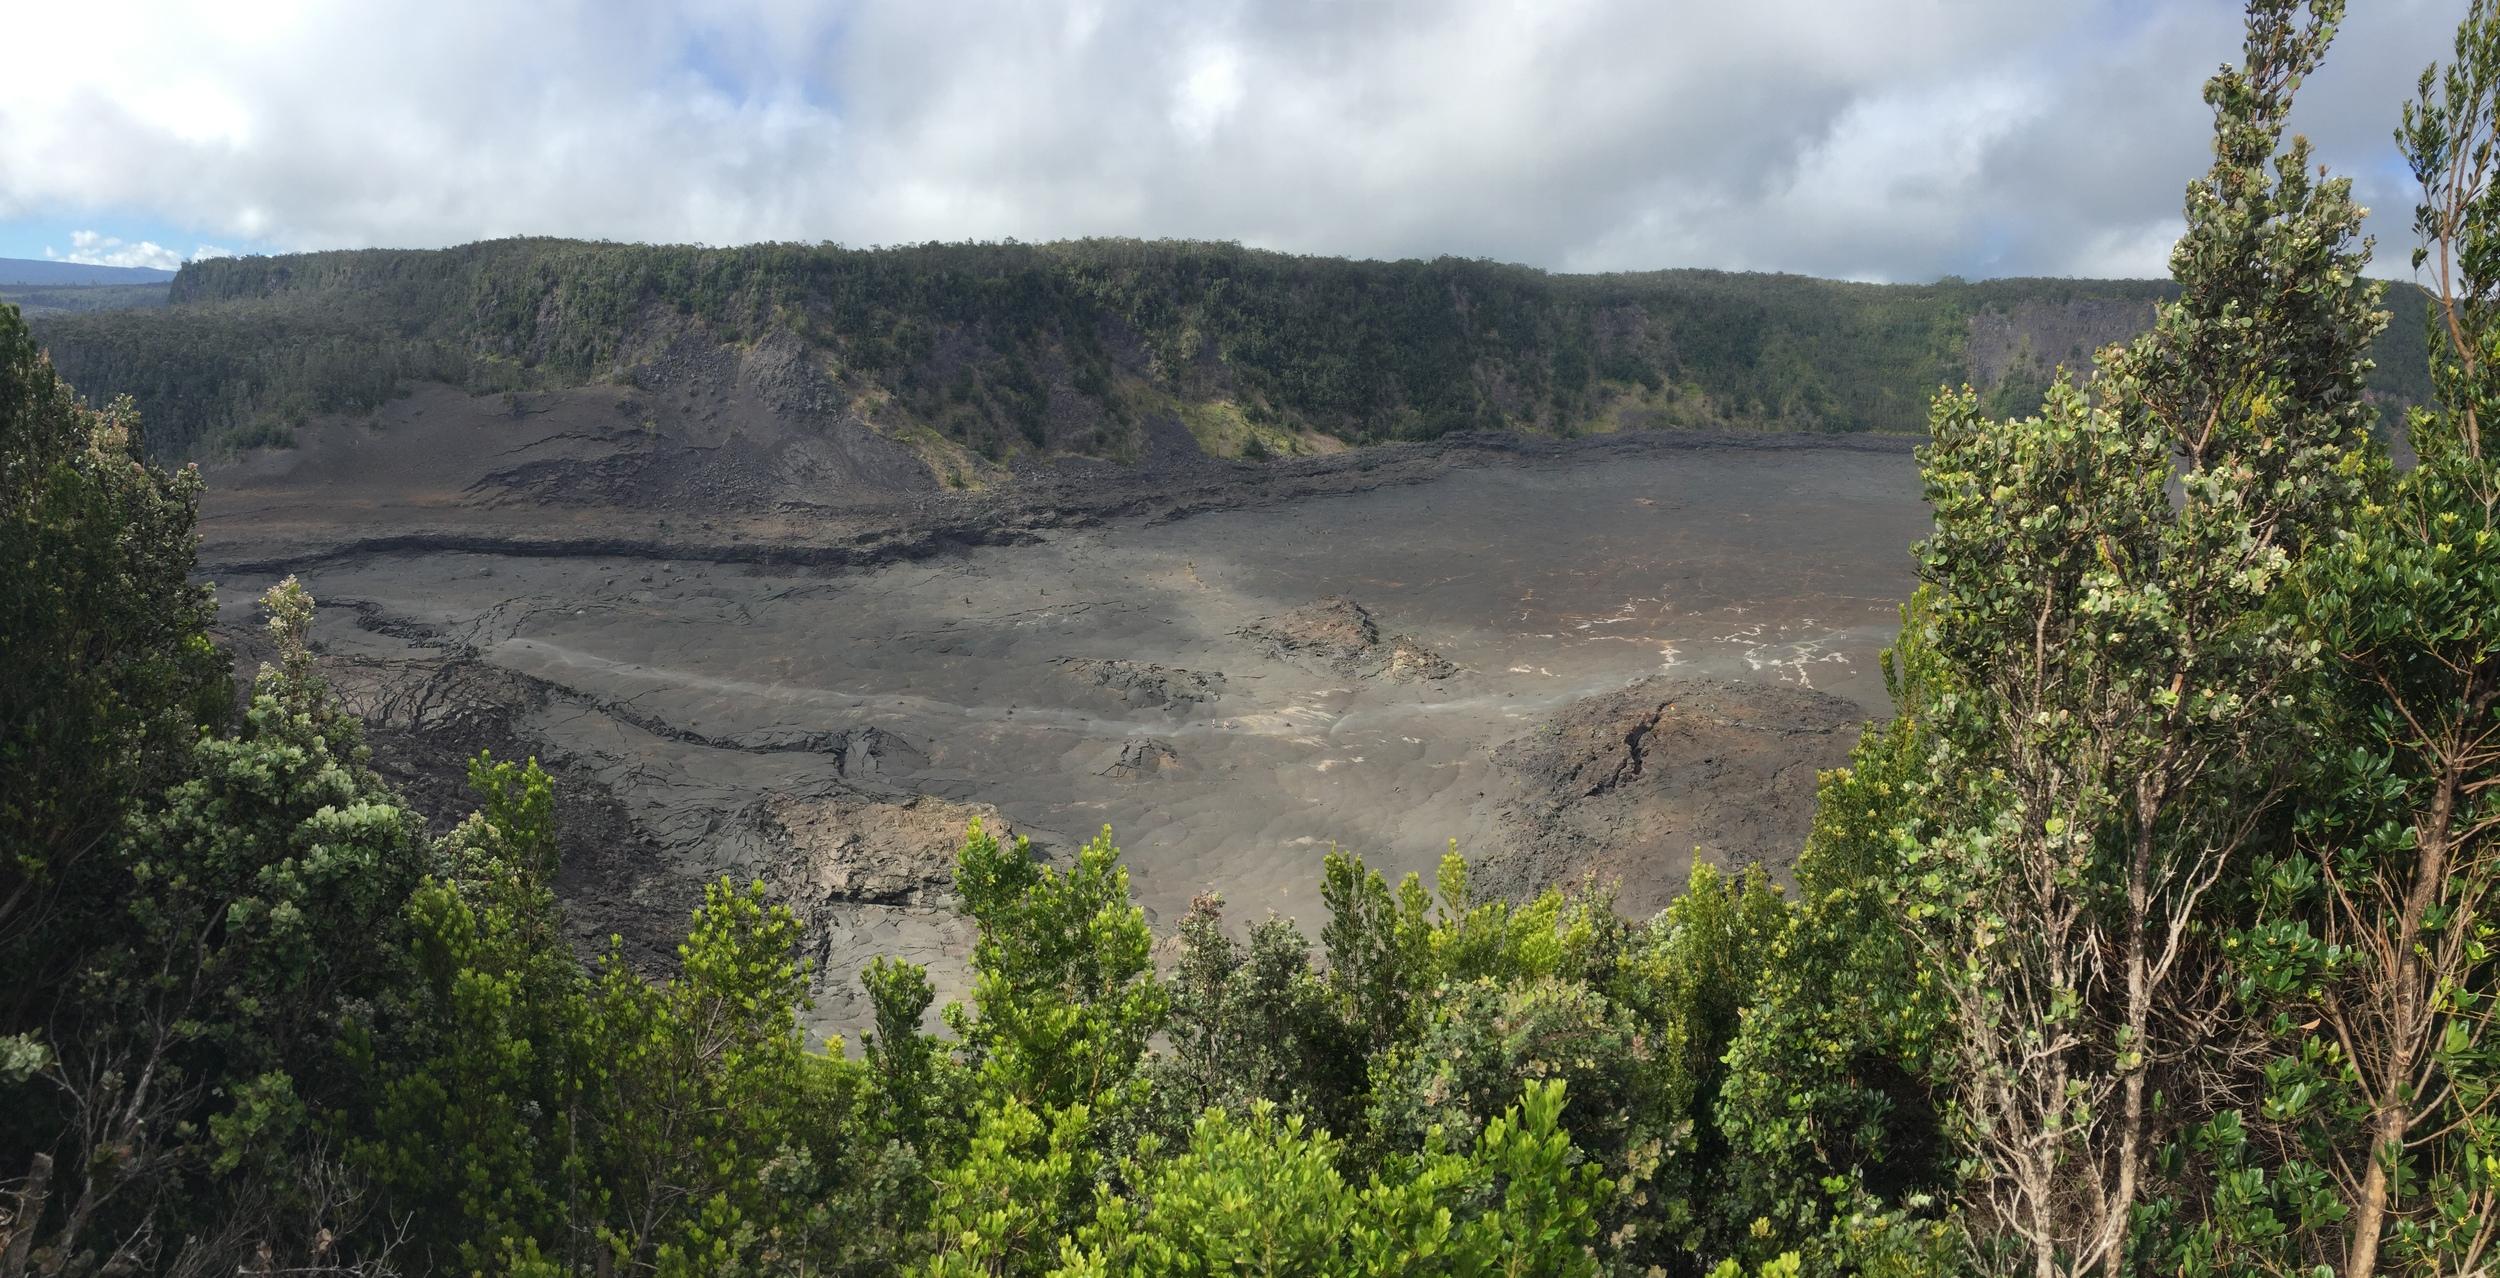 Kilauea Iki Trail at Volcano National Park